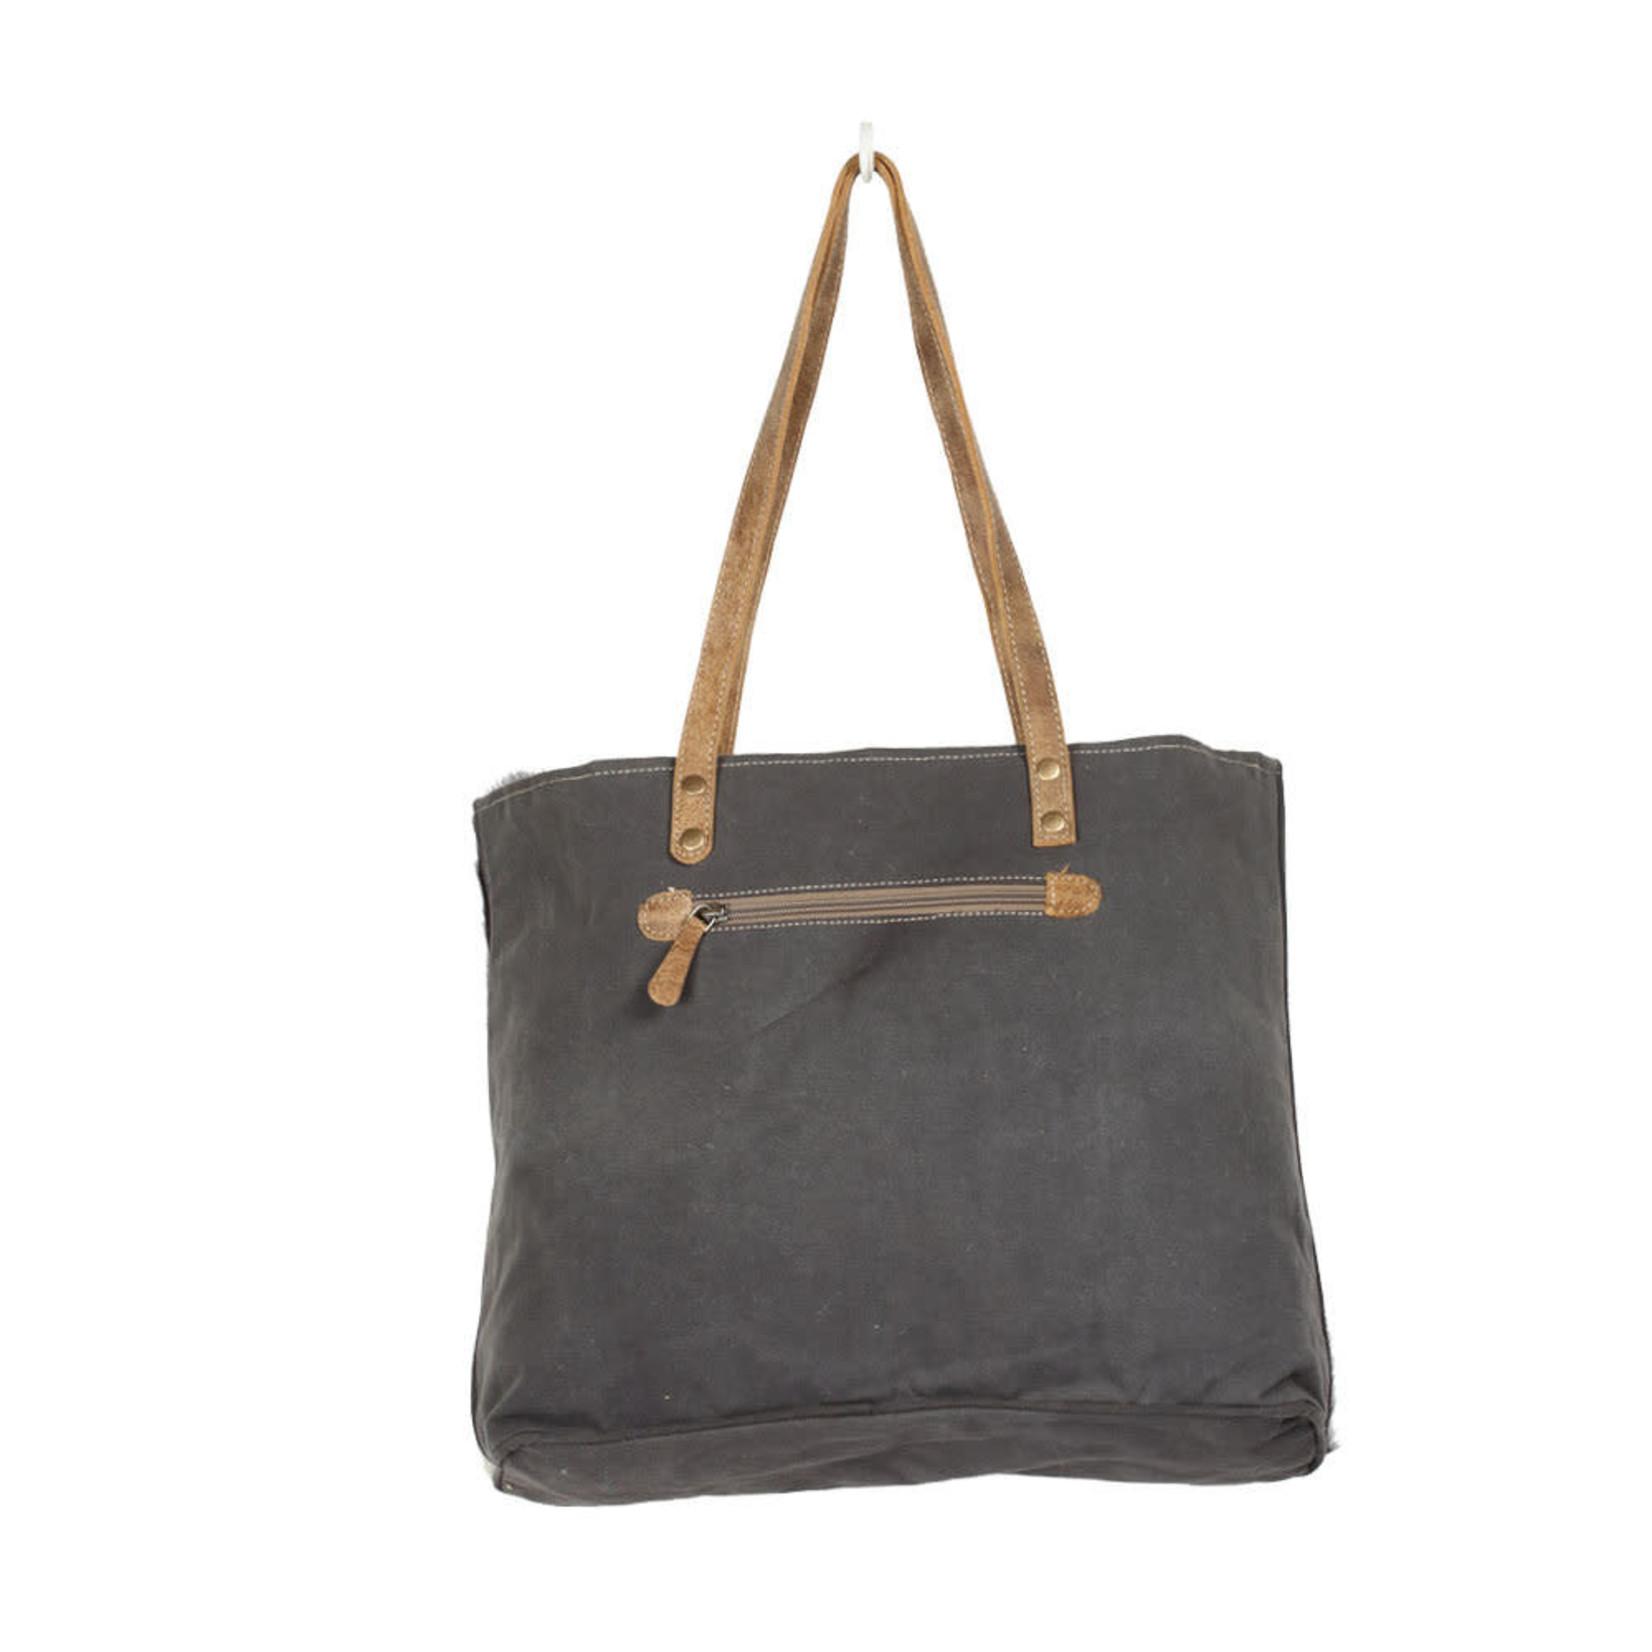 Myra Bags S-1375 Chevron Cross Design Tote Bag